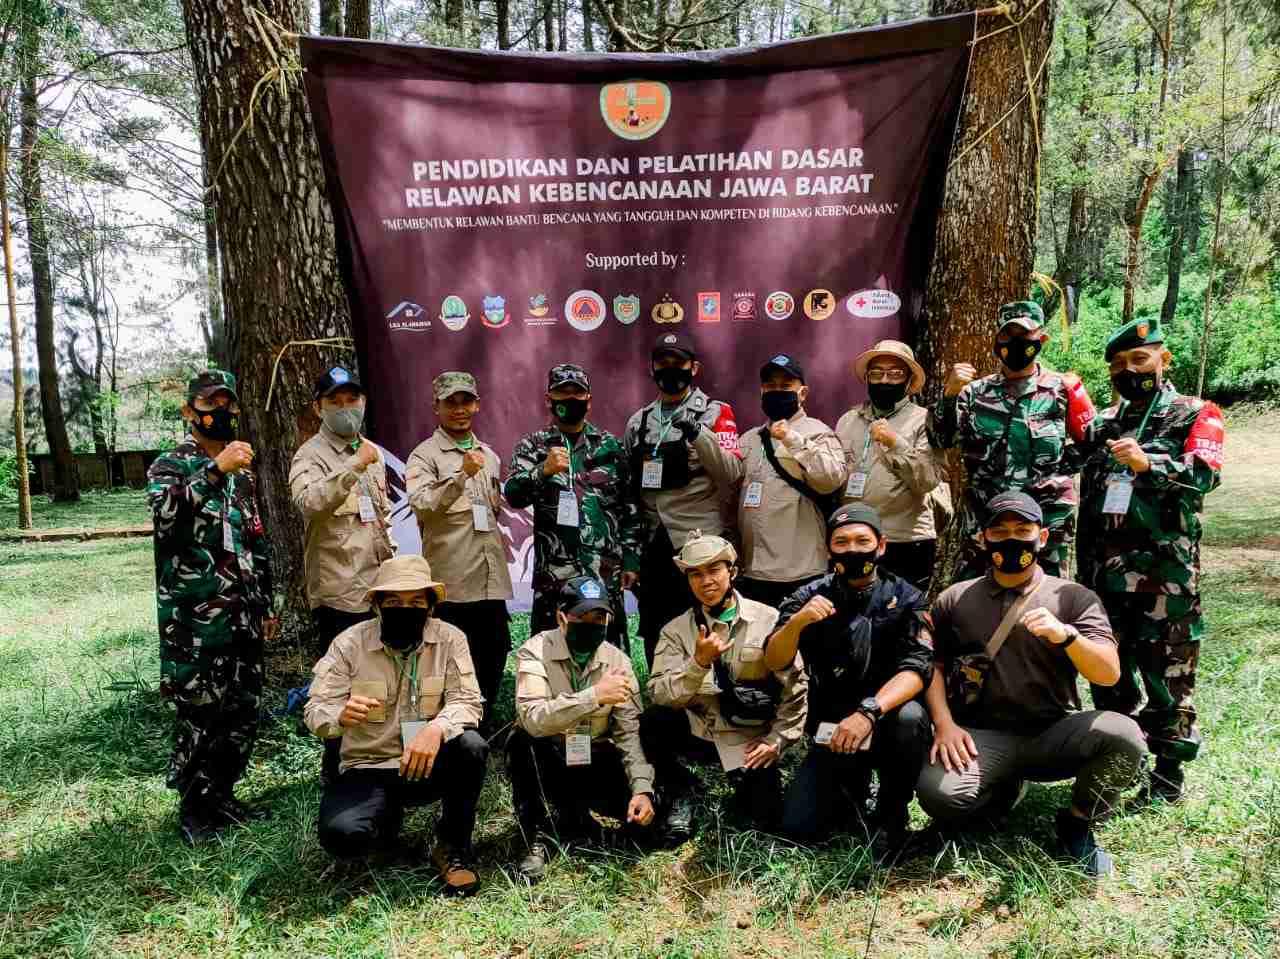 Foto Bersam Diklatsar REBBANA Tahap II Se Jawa Barat Camp Situ Cibeureum Desa Sukakarya Kecamatan Samarang Kabupaten Garut // jurnal86.com // Kang Dian